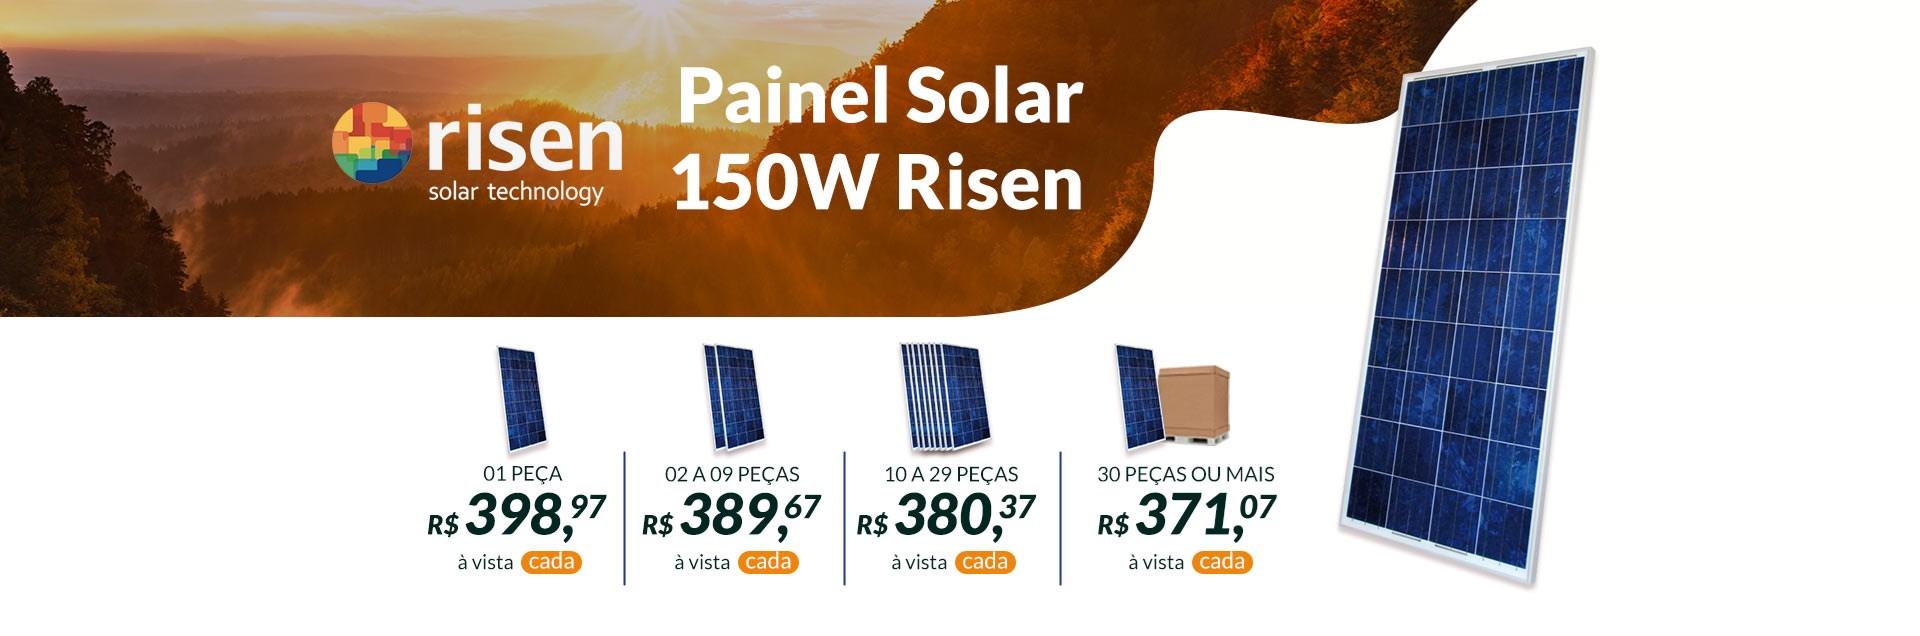 Banner Painel Solar 150W Risen